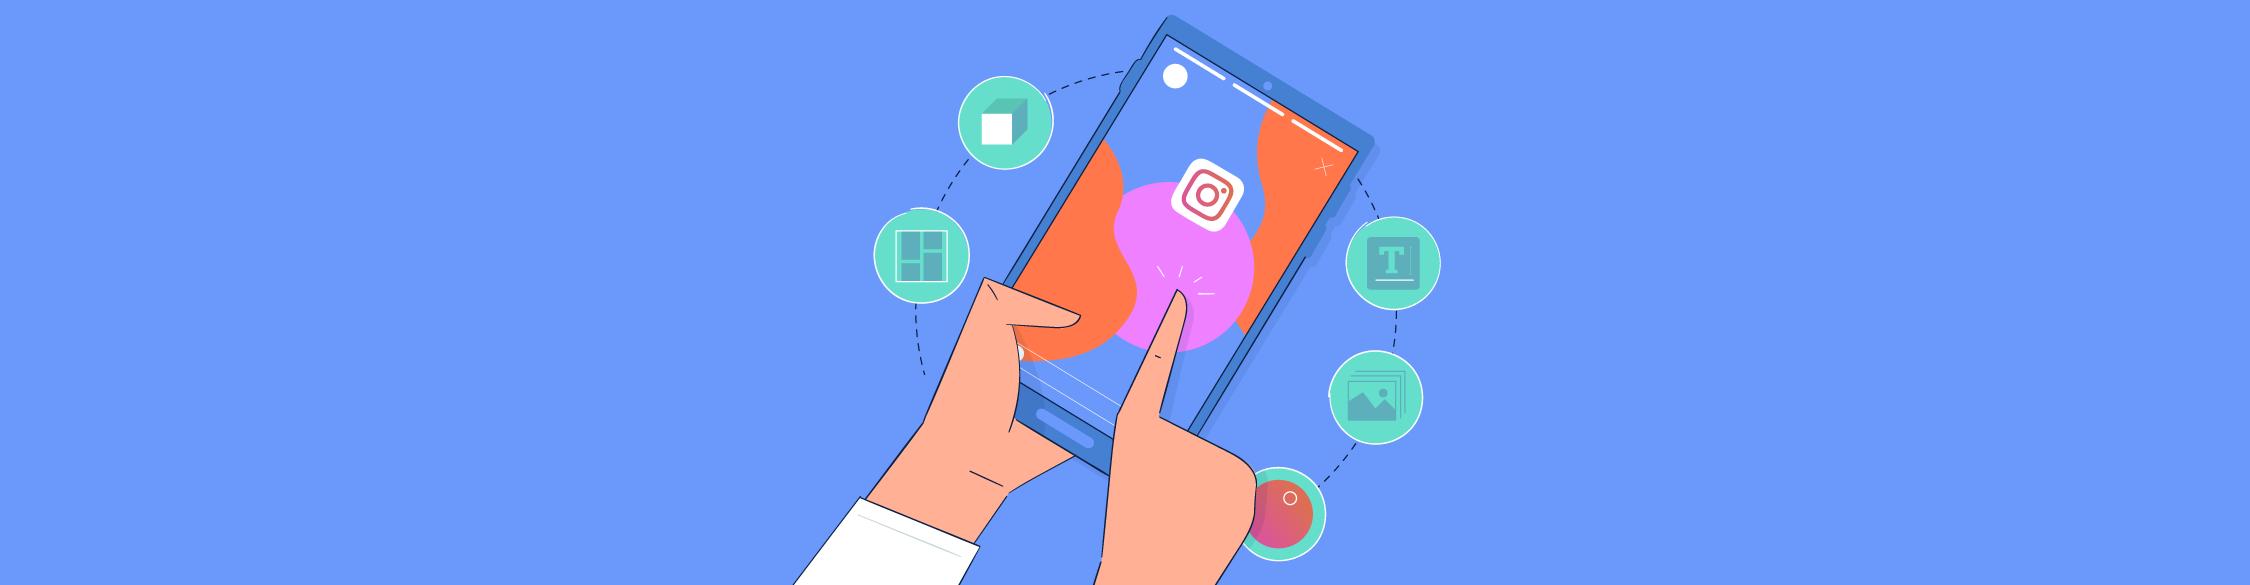 instagram story design - header